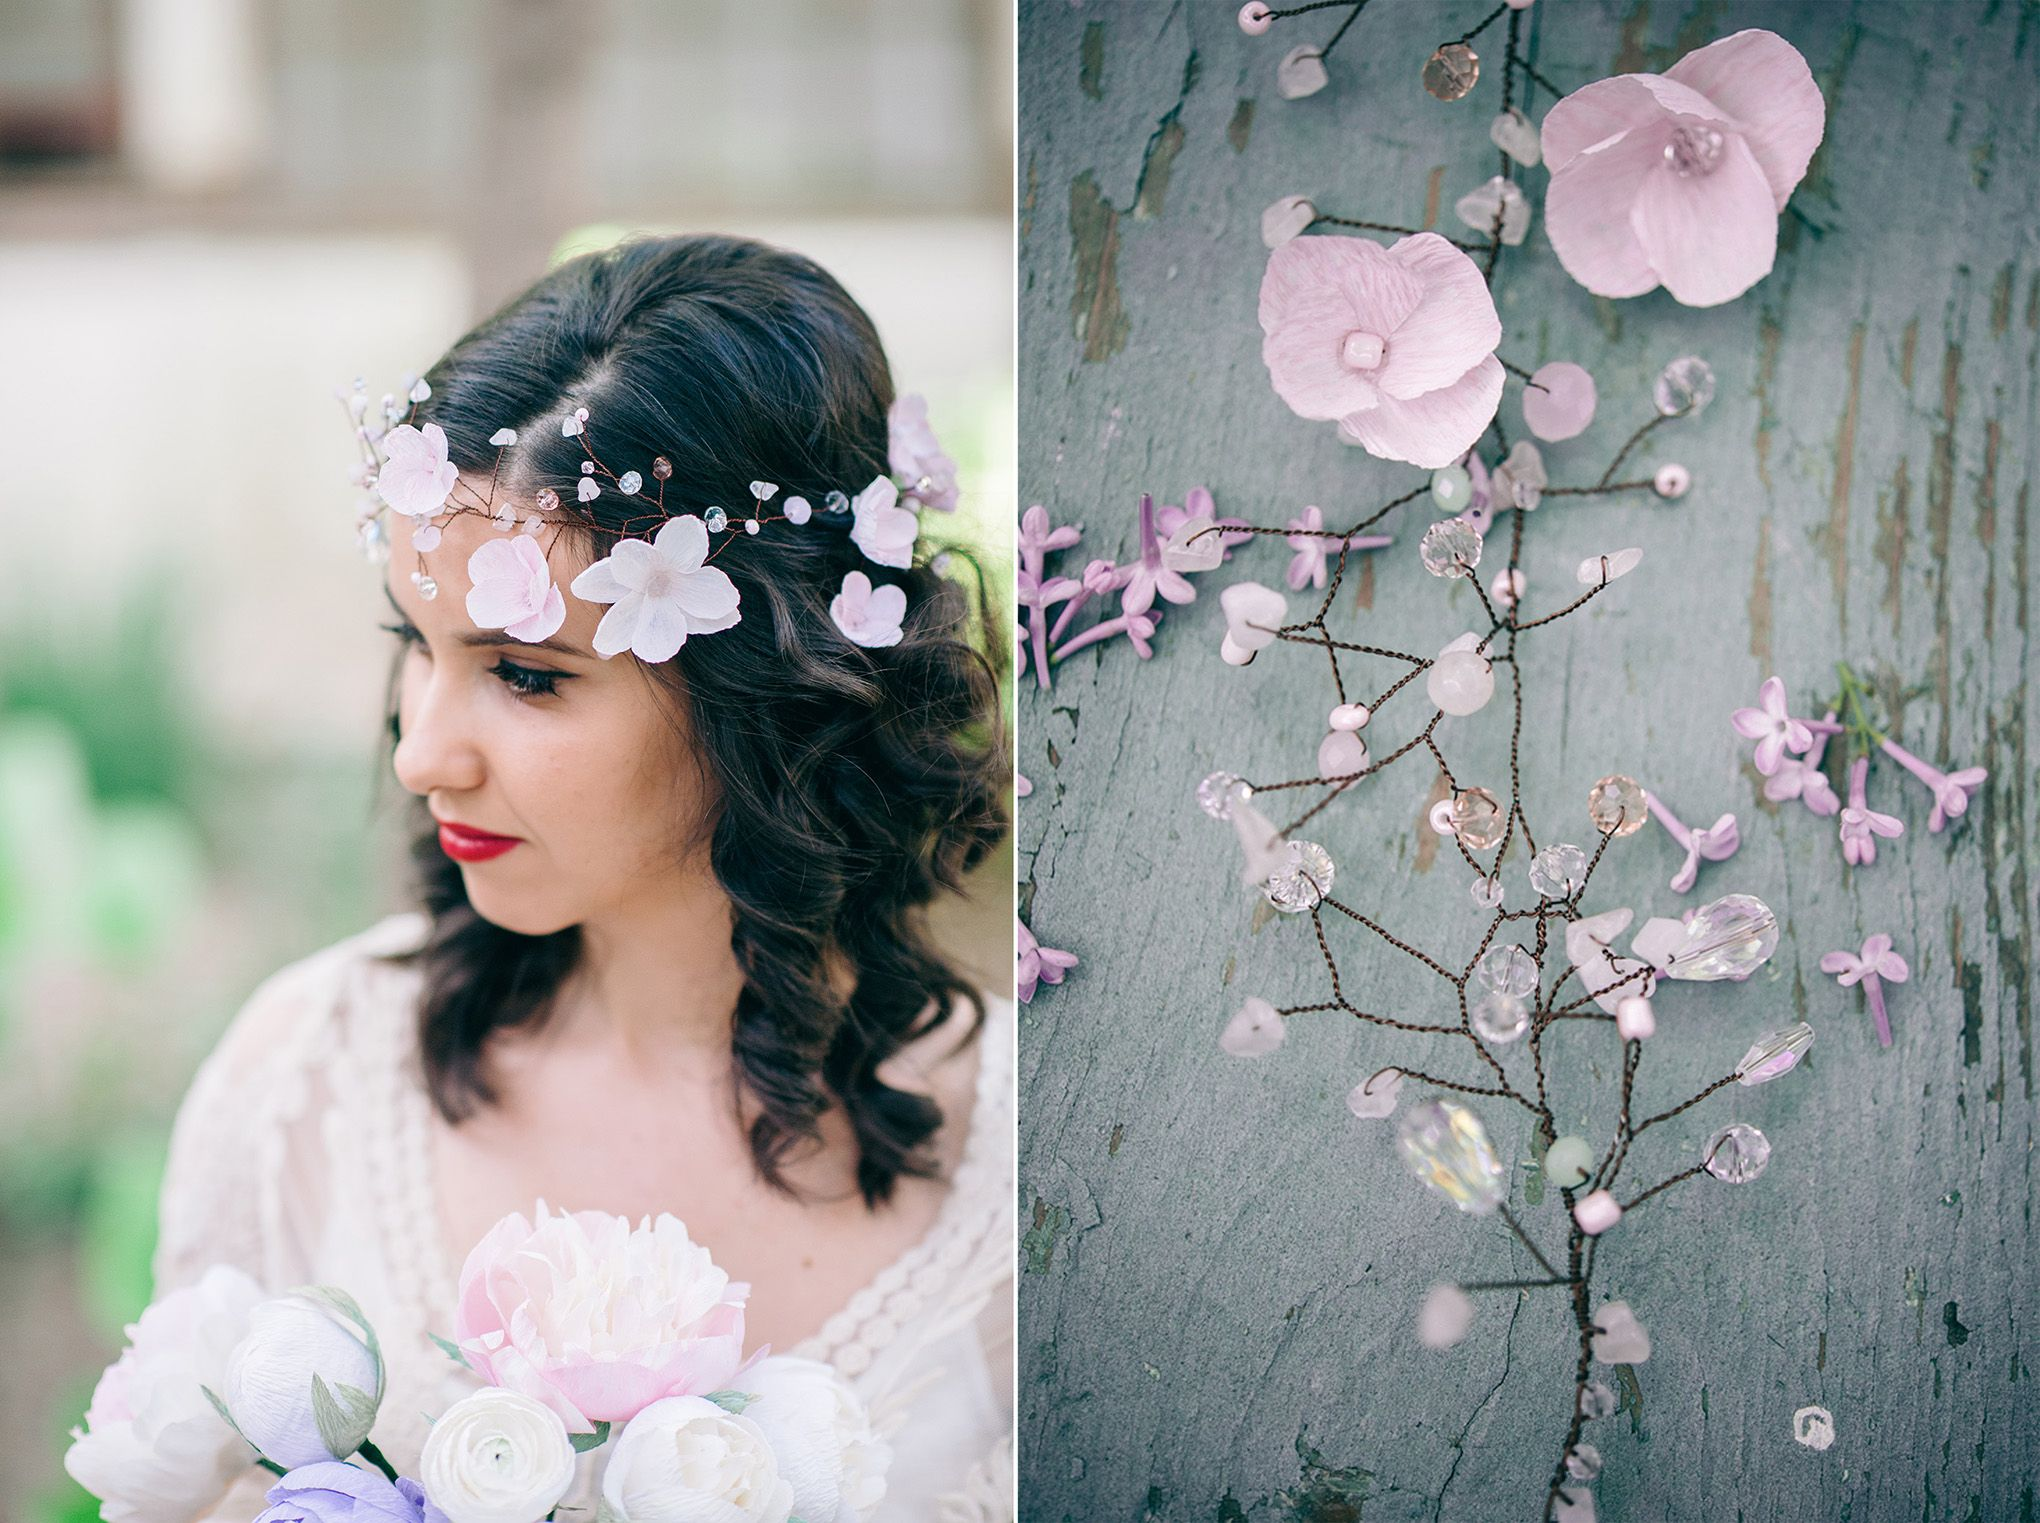 Handmade bridal headpiece lovely wedding hair adornment by